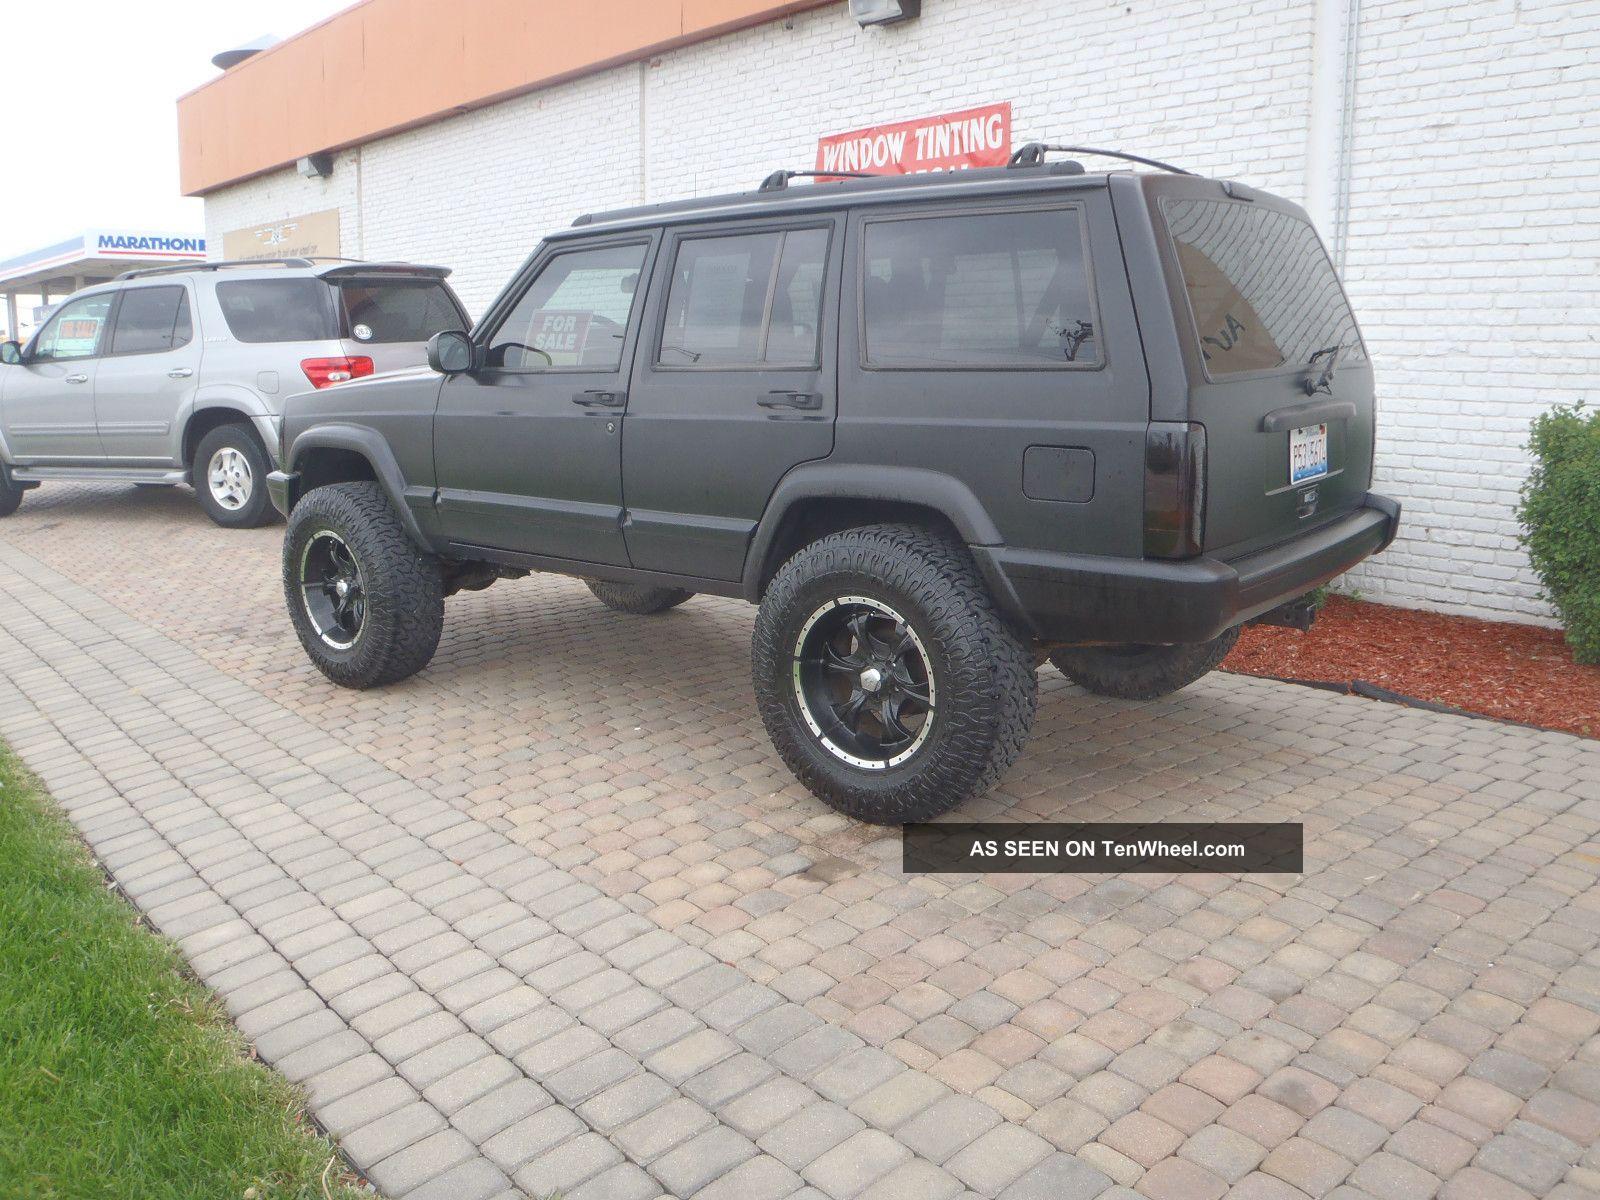 1997 Jeep Cheerokee 4 Inch Lift A / C Flat Black Full Cage 4x4 Nitro Tires Perfect Cherokee photo